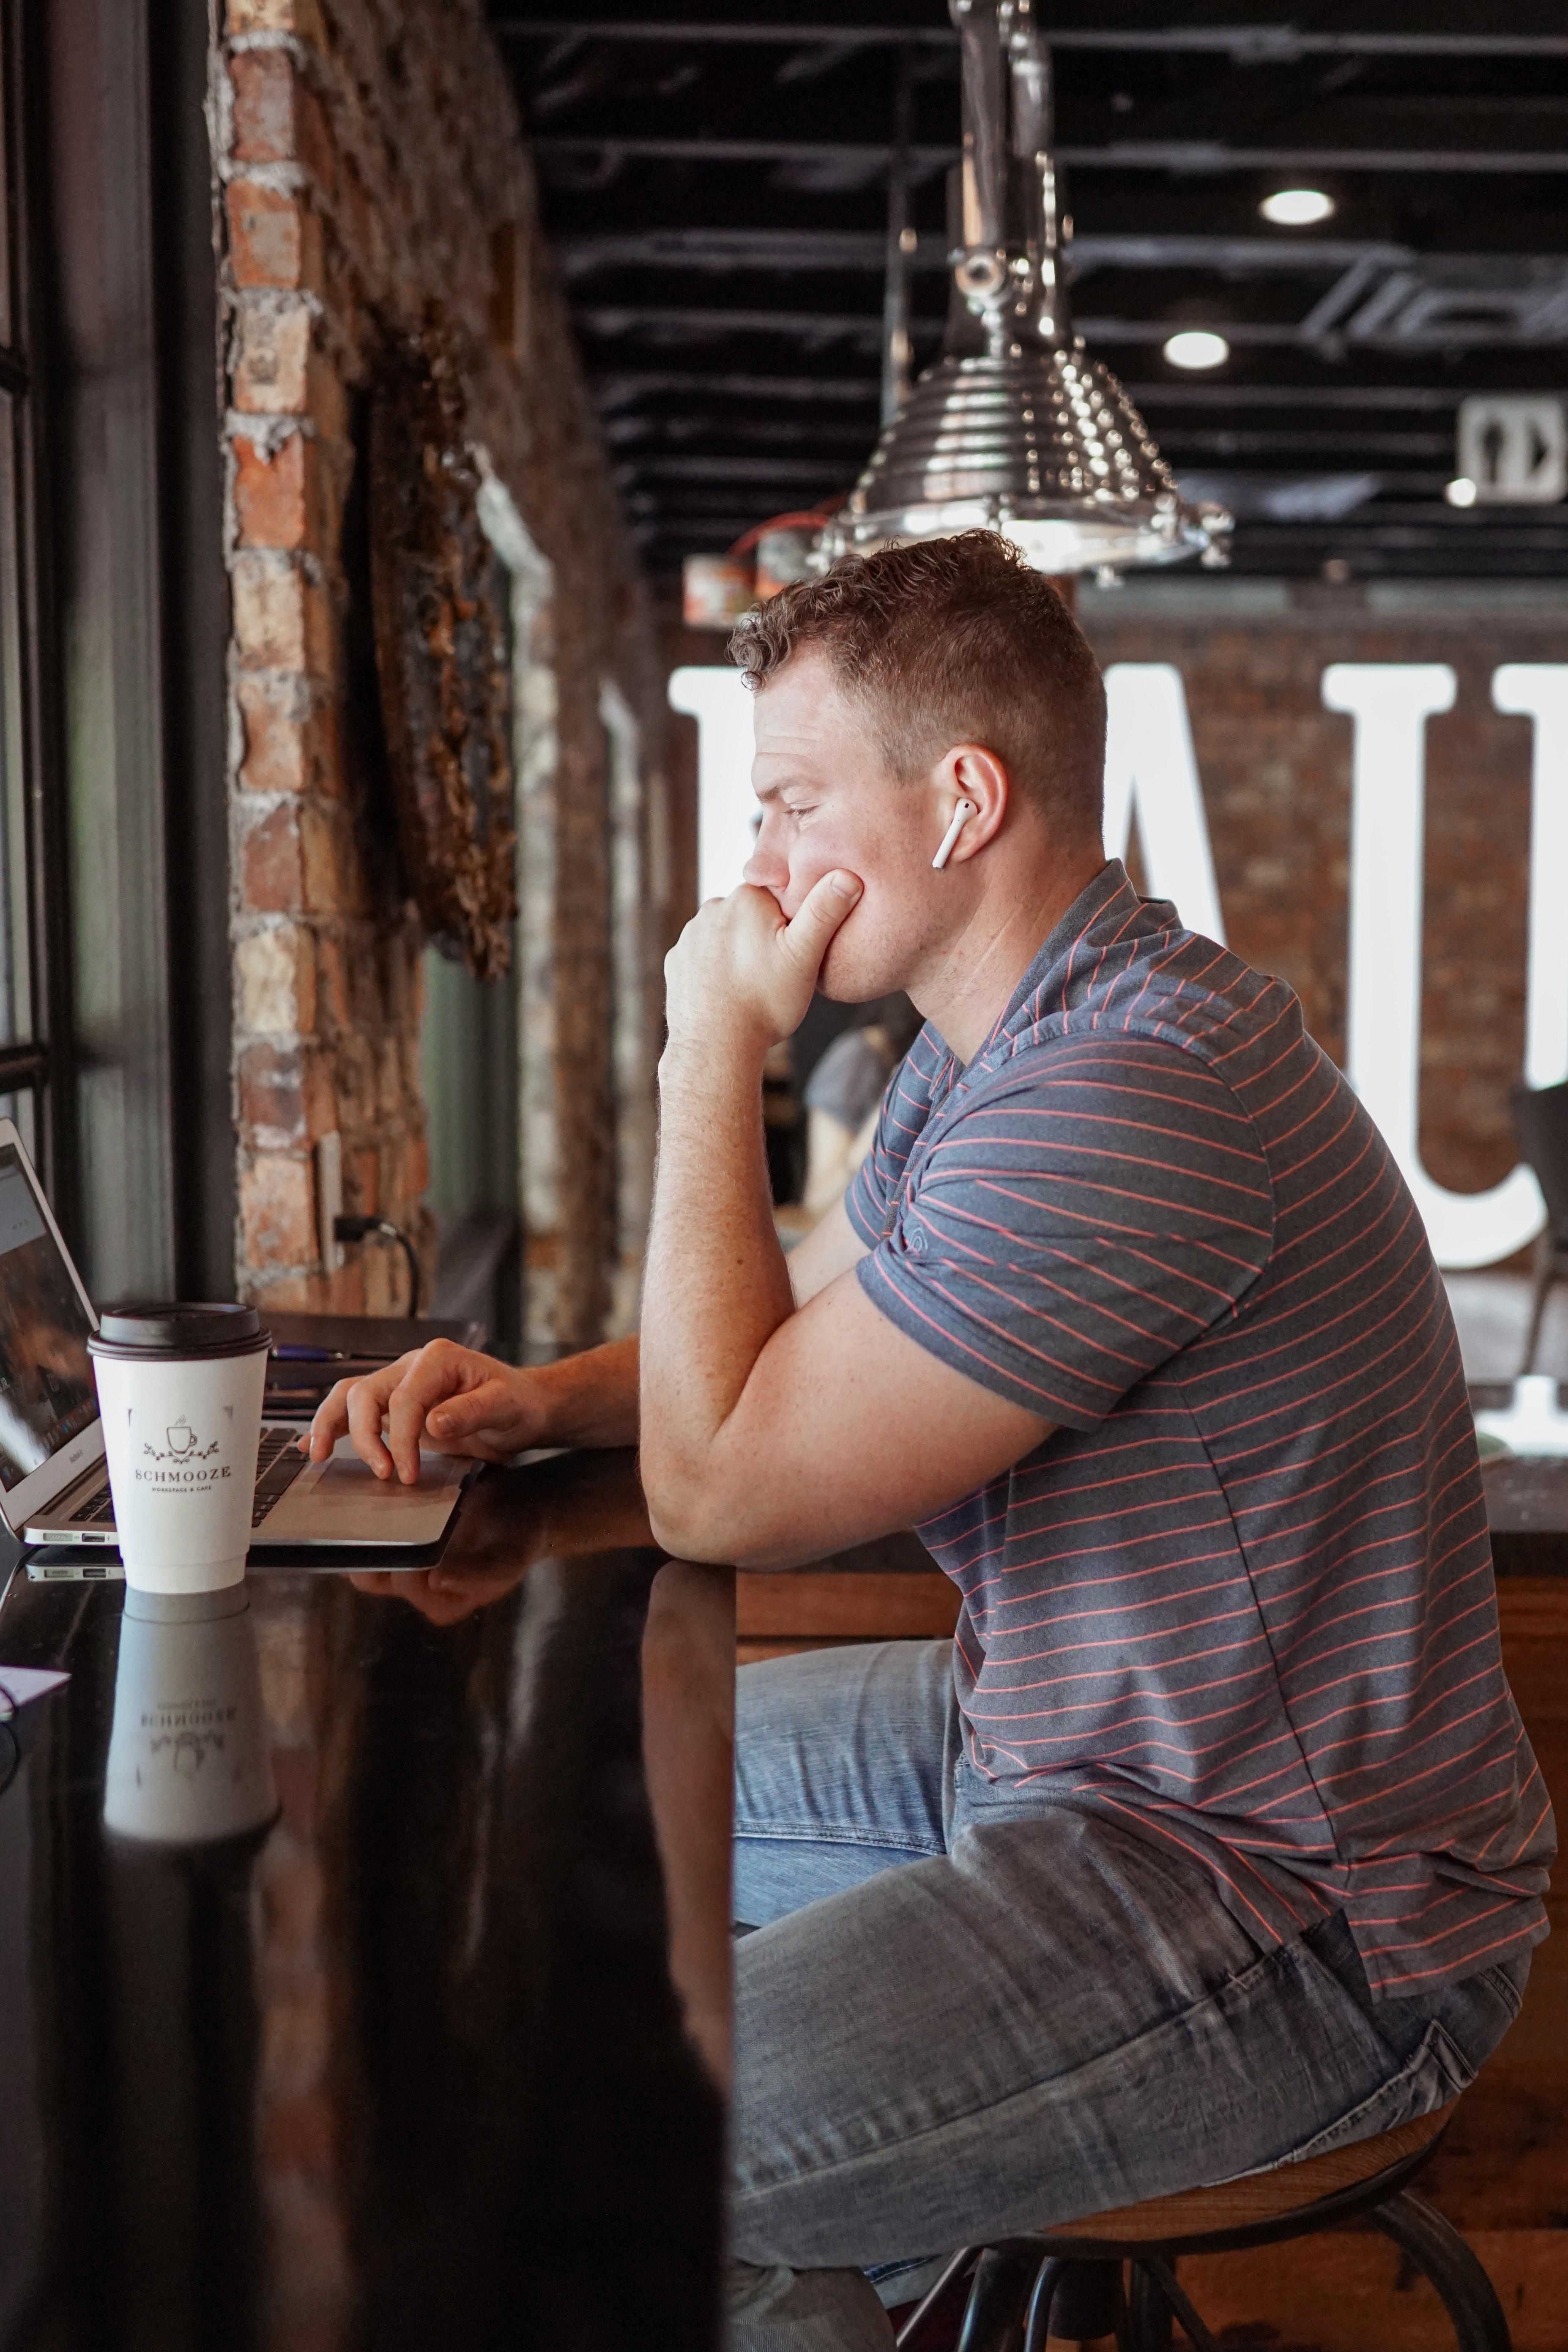 man sitting on chair using gray laptop